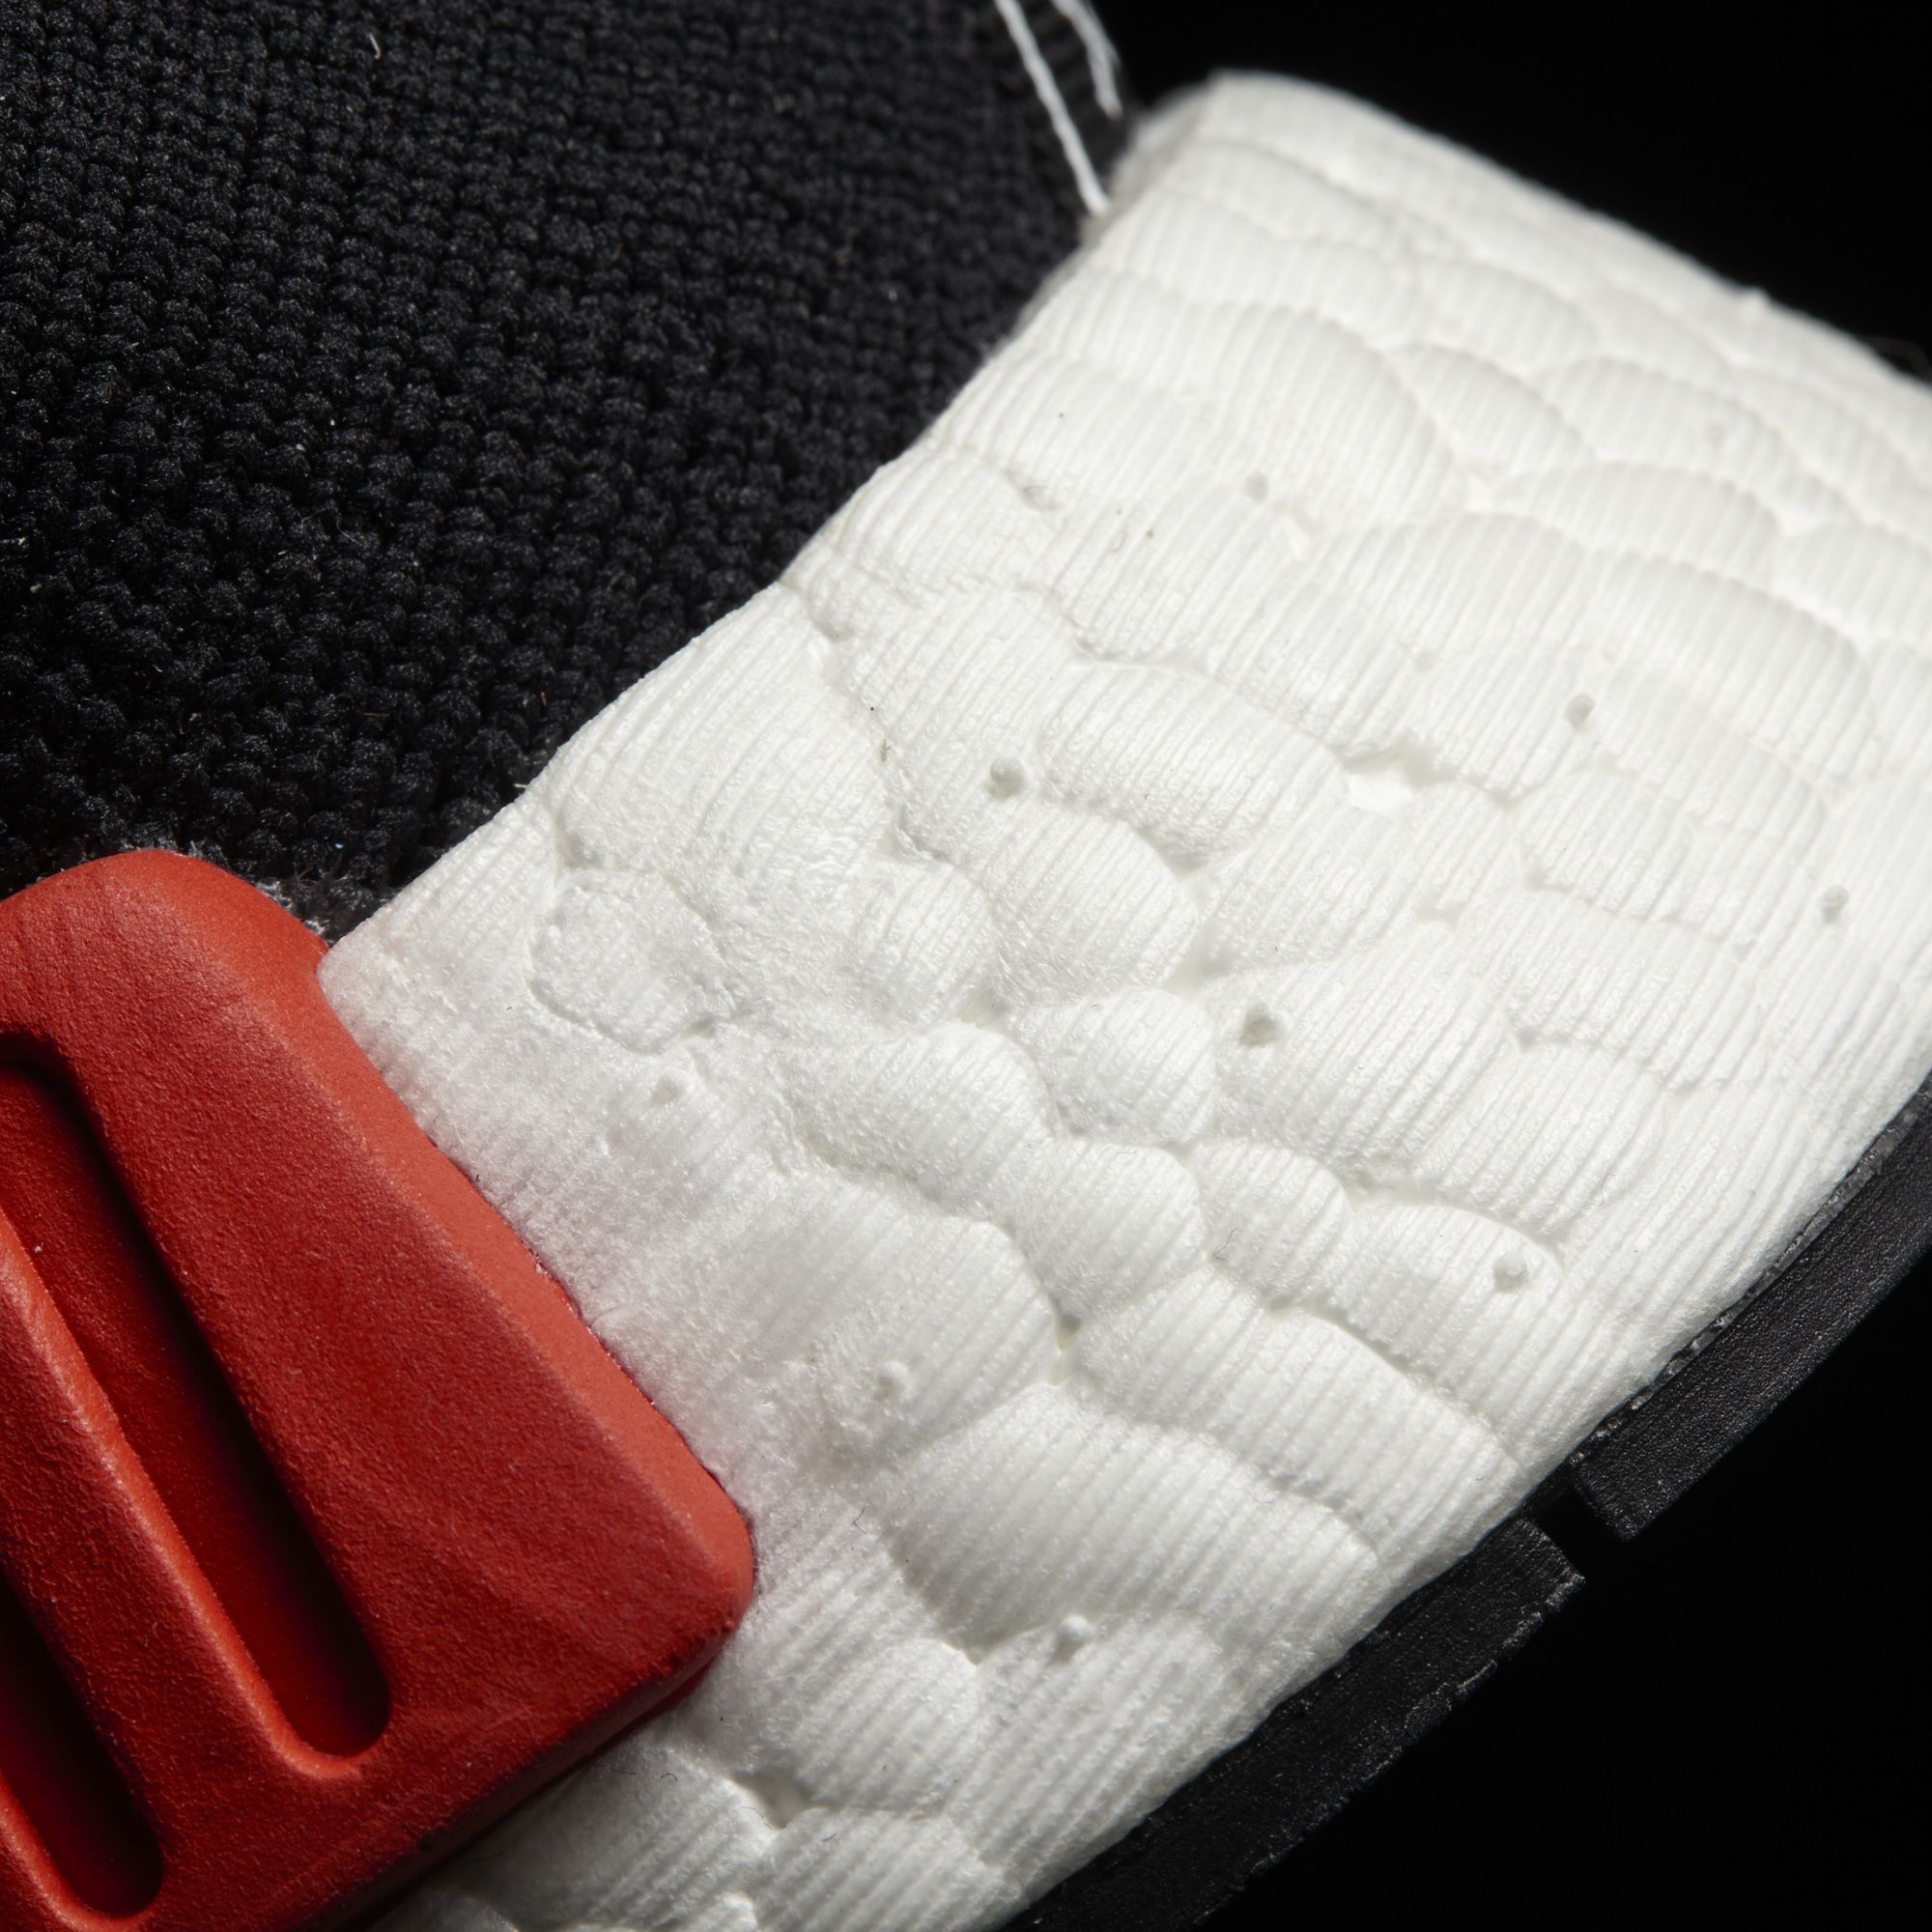 OG Adidas NMD S79168 Heel Detail